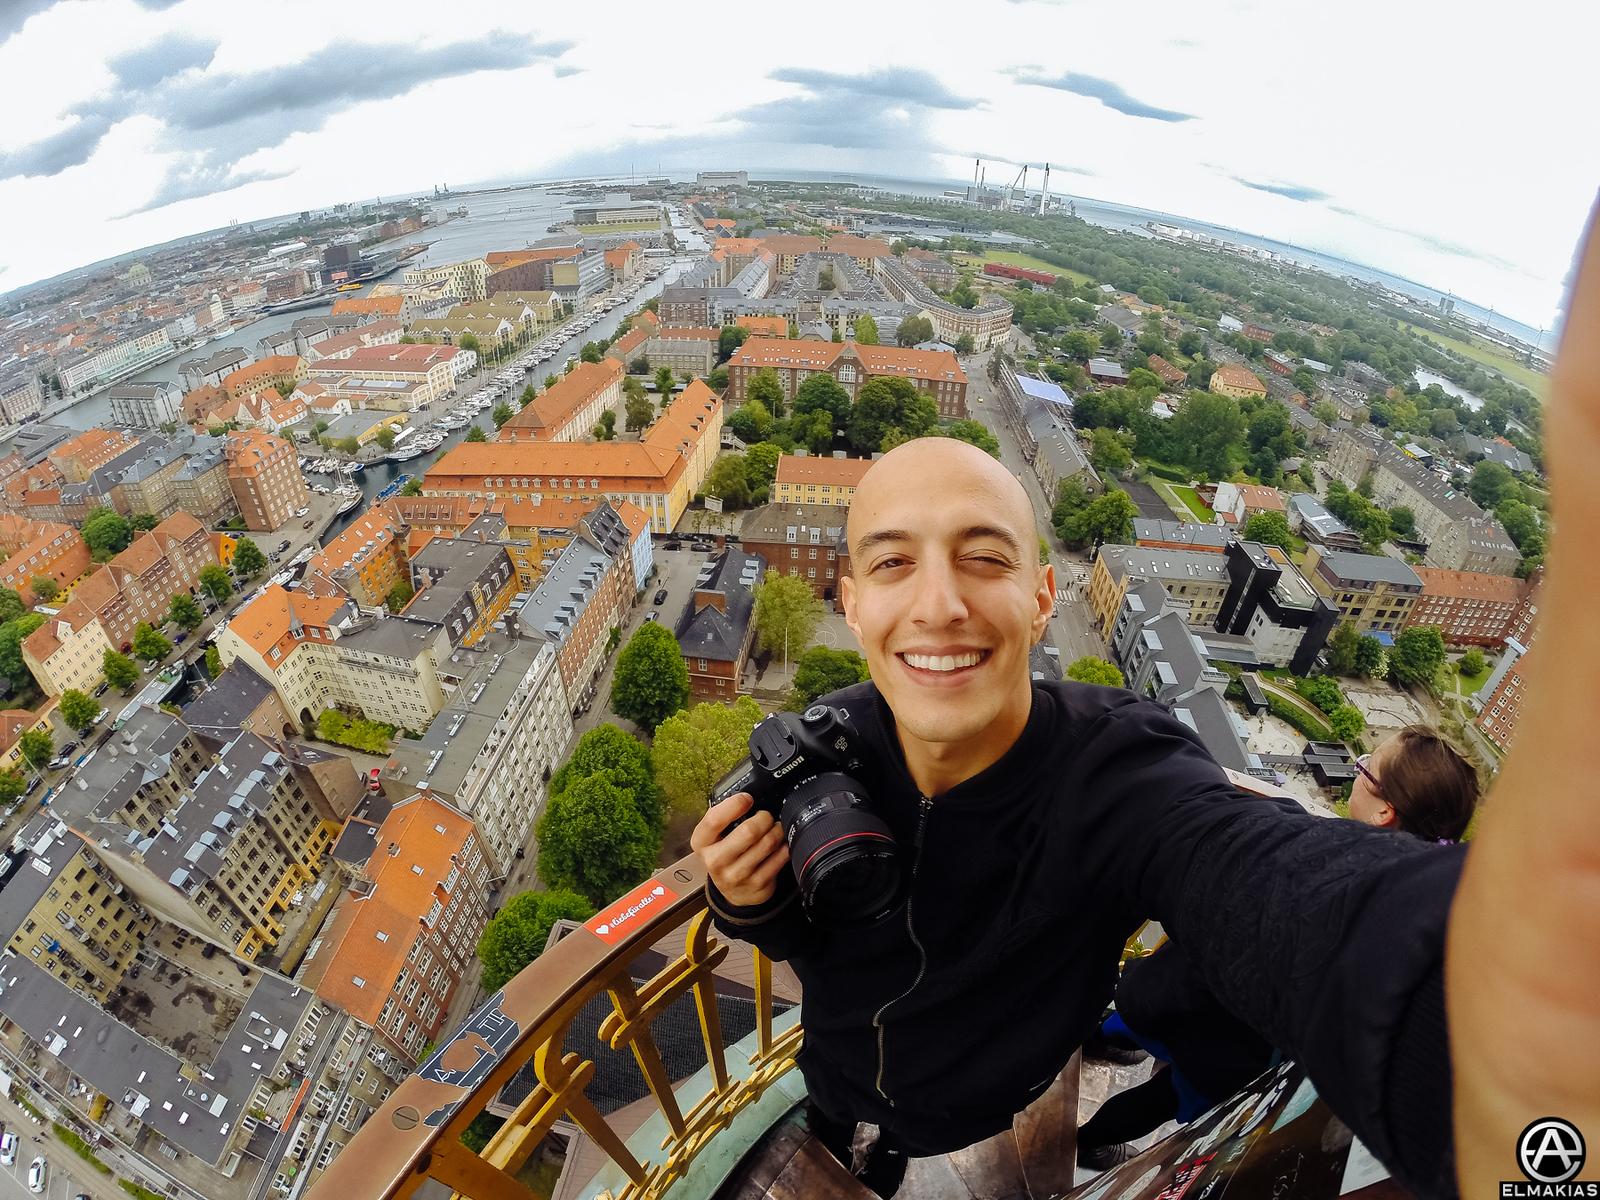 Adam Elmakias in Copenhagen, Denmark